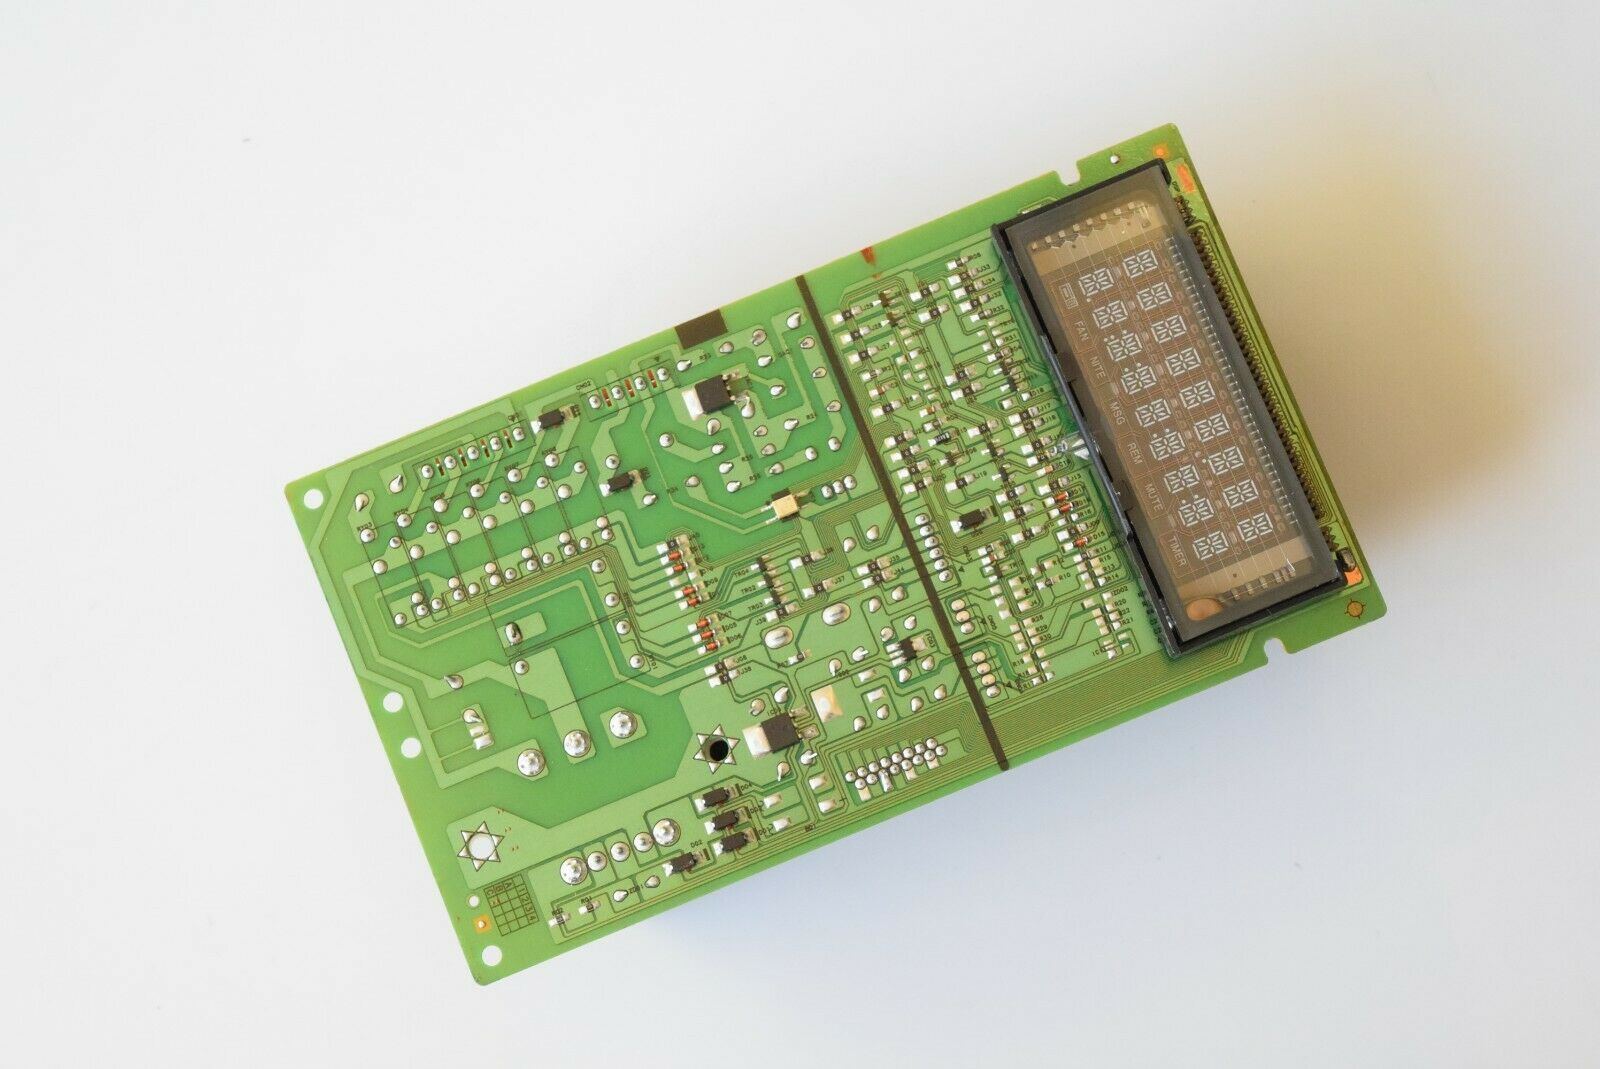 WPW10127098 NEW GENUINE OEM MAYTAG MICROWAVE CONTROL BOARD IN ORIGINAL BOX